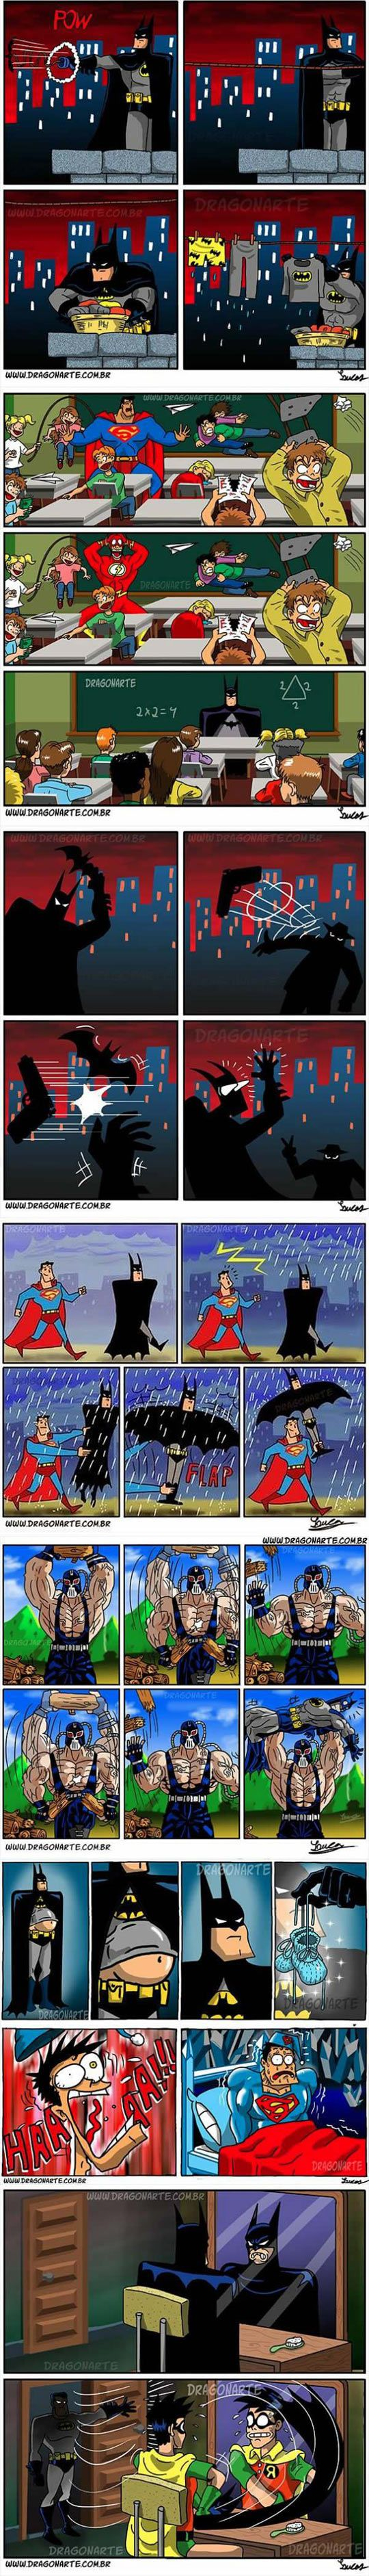 Funniest Batman Comics Collection Part II